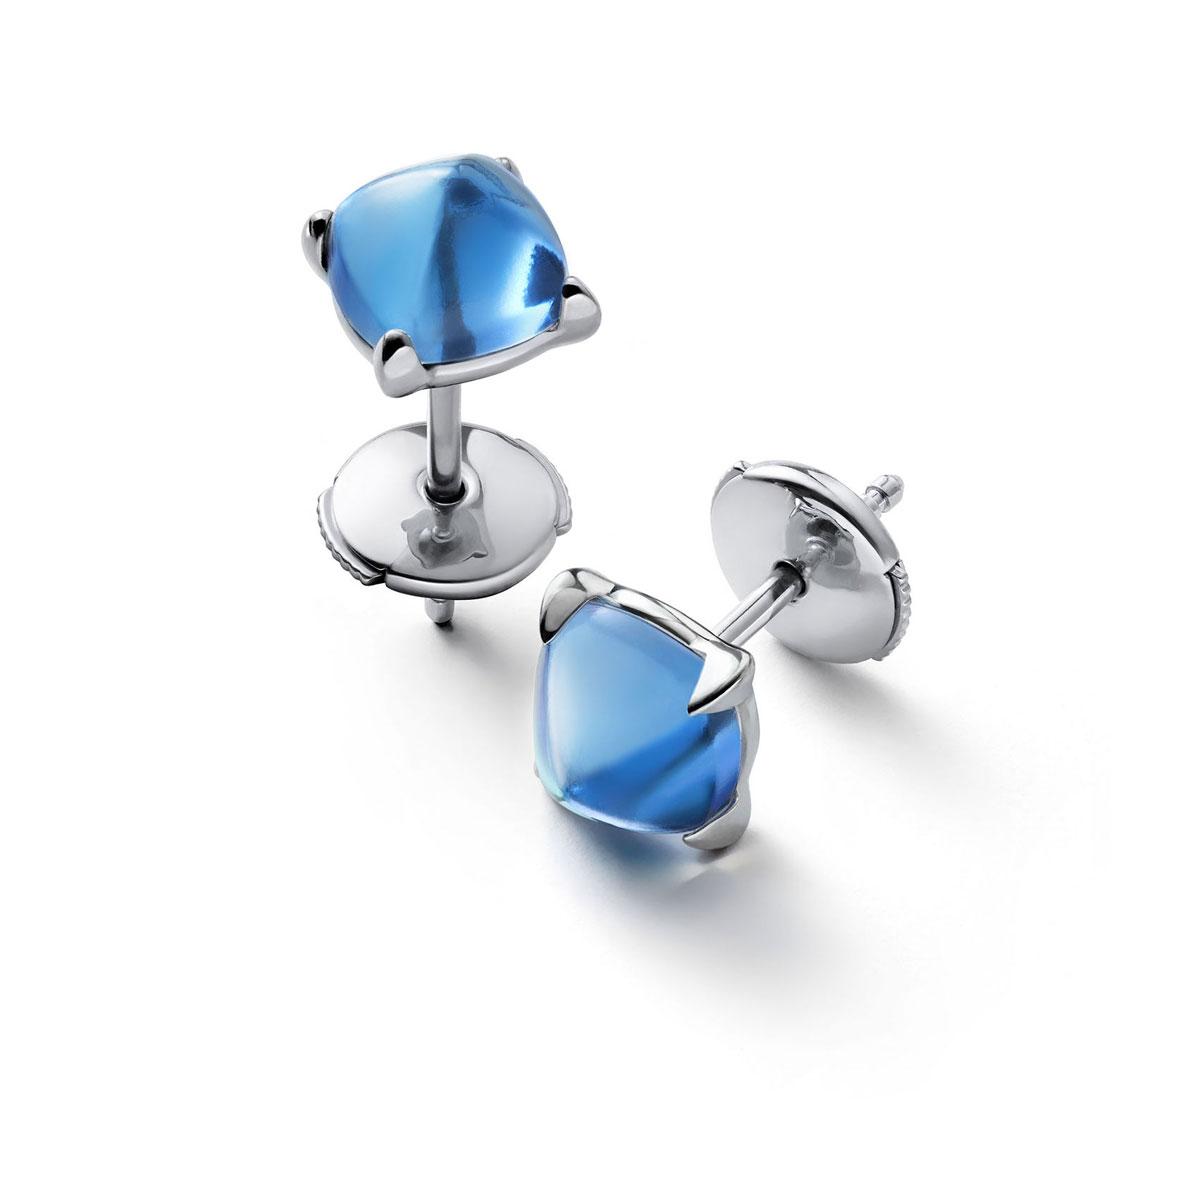 Baccarat Crystal Medicis Mini Stud Earrings Sterling Silver Blue Riviera